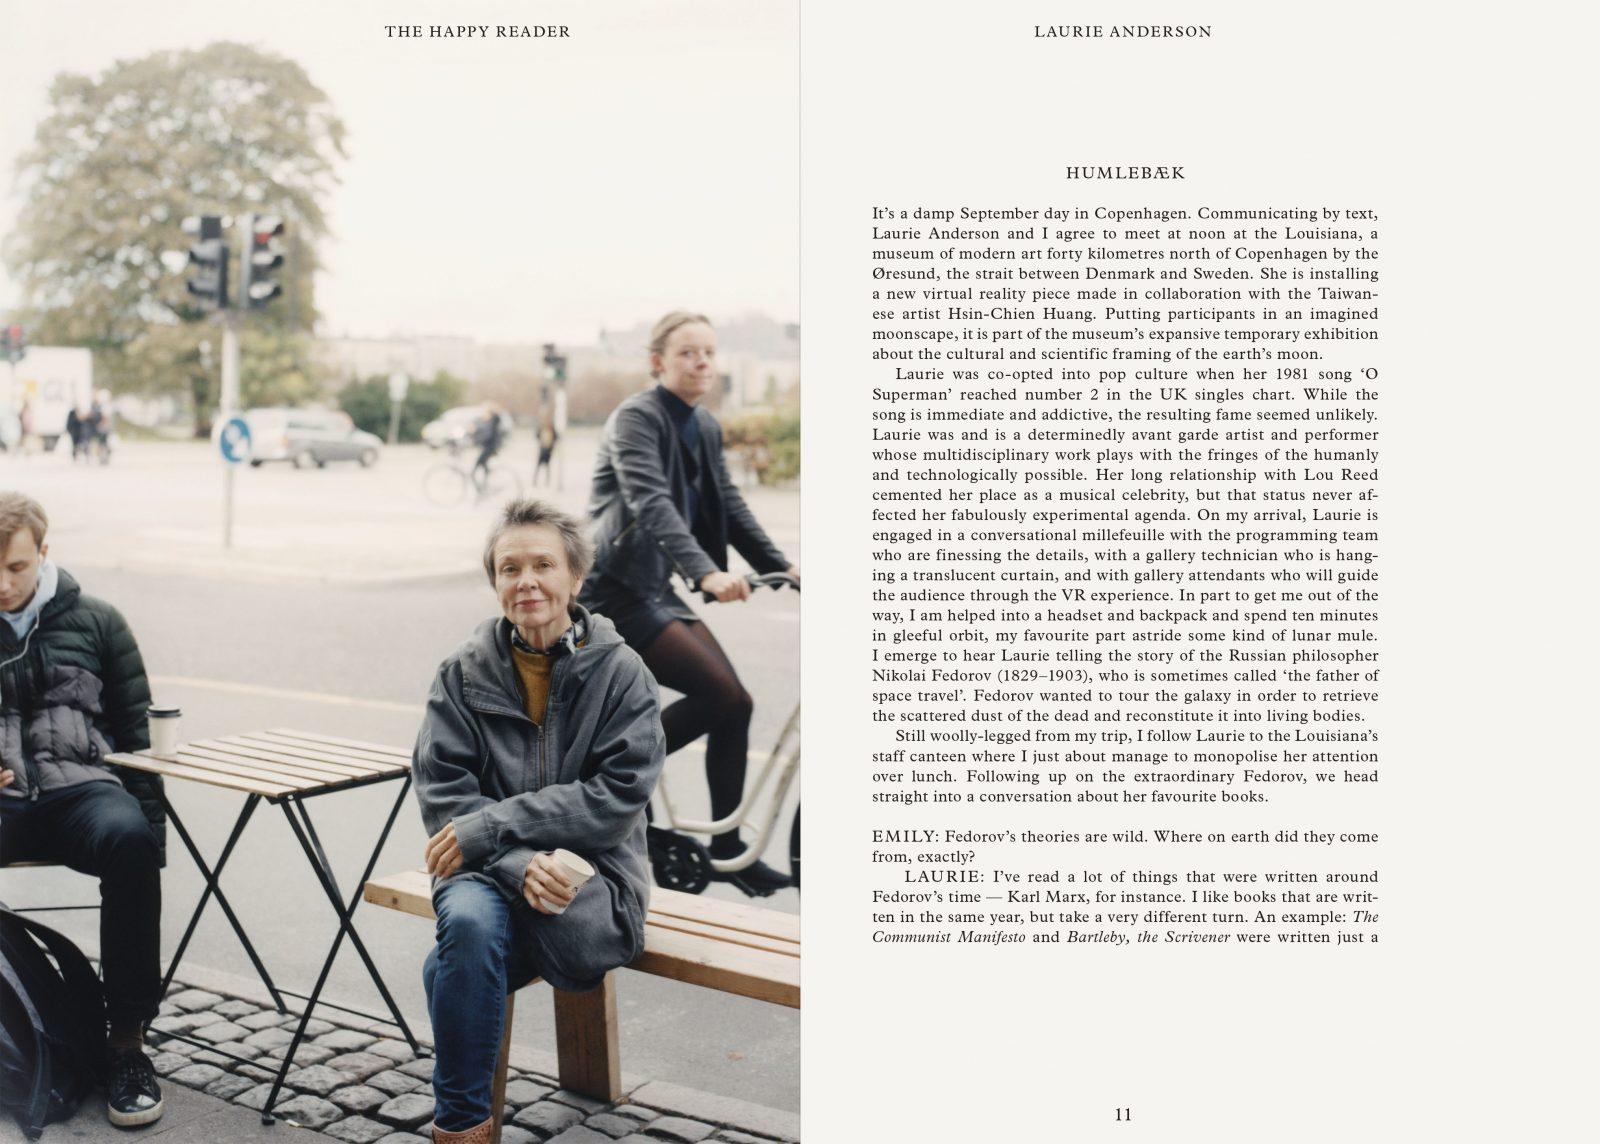 Mark Peckmezian for The Happy Reader News — Webber 5a5b41c8aa0